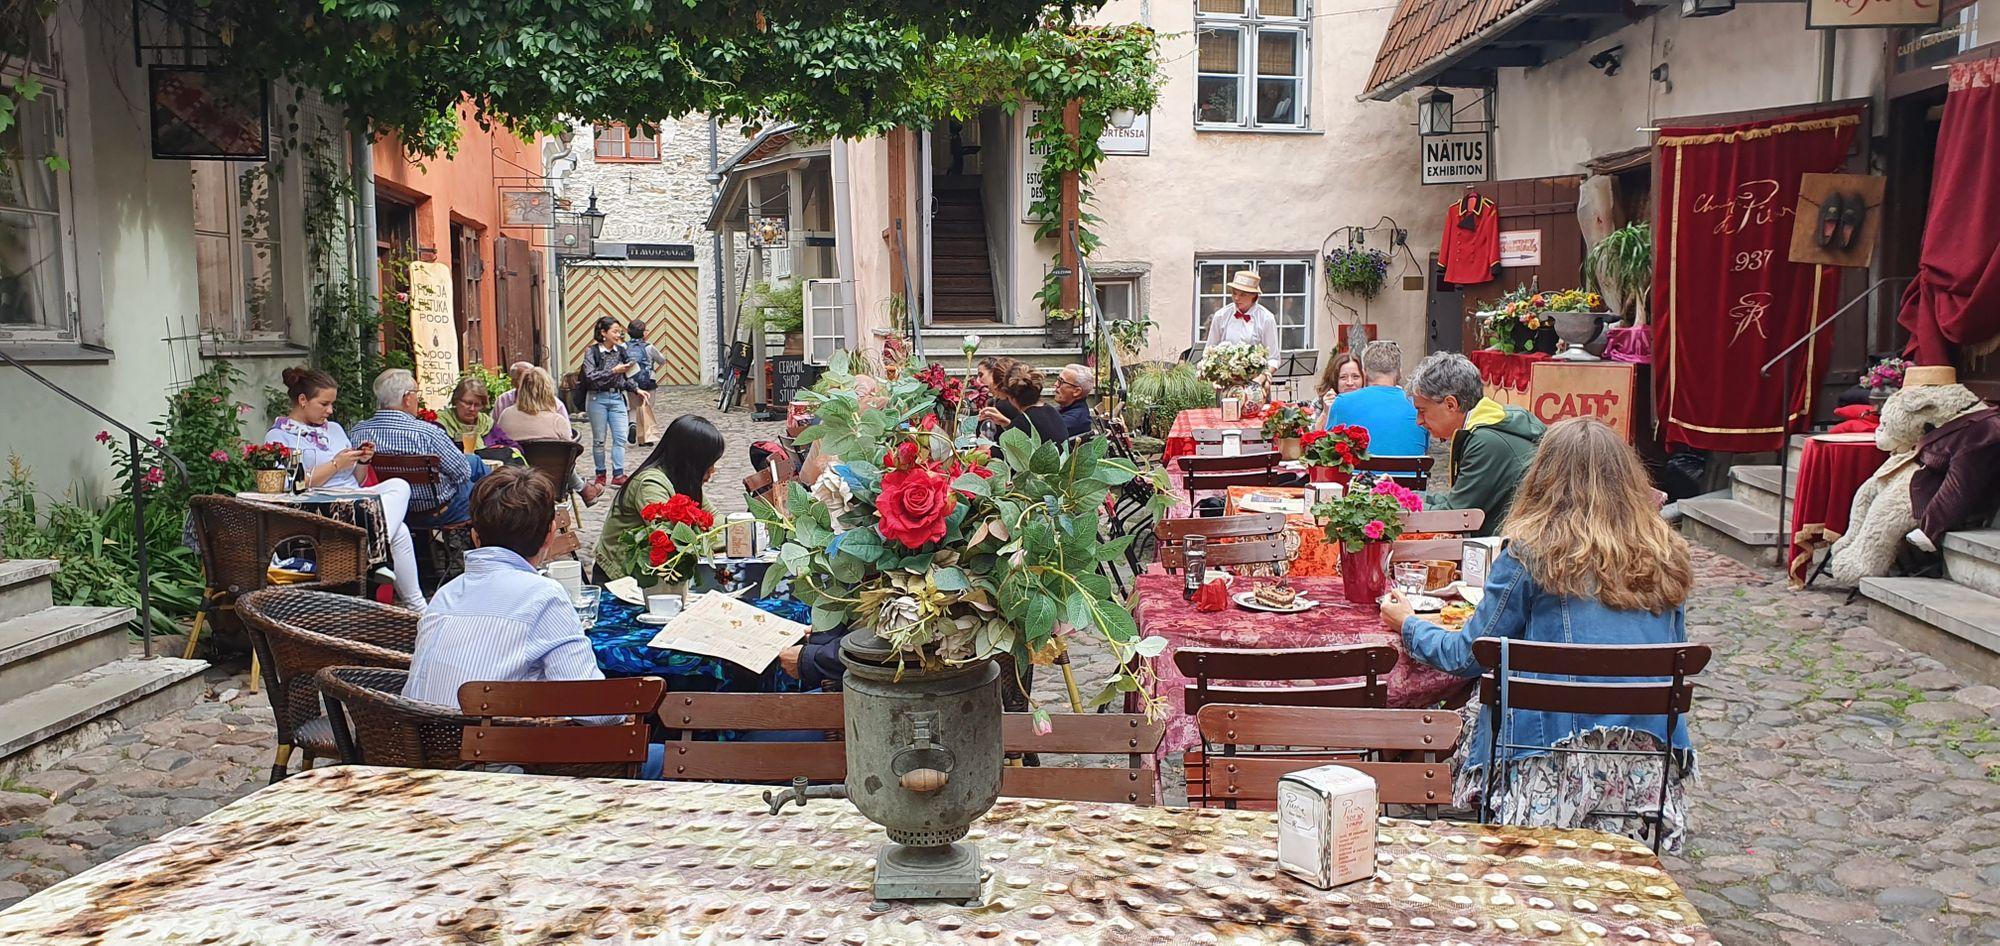 Bar en un callejón de Tallinn